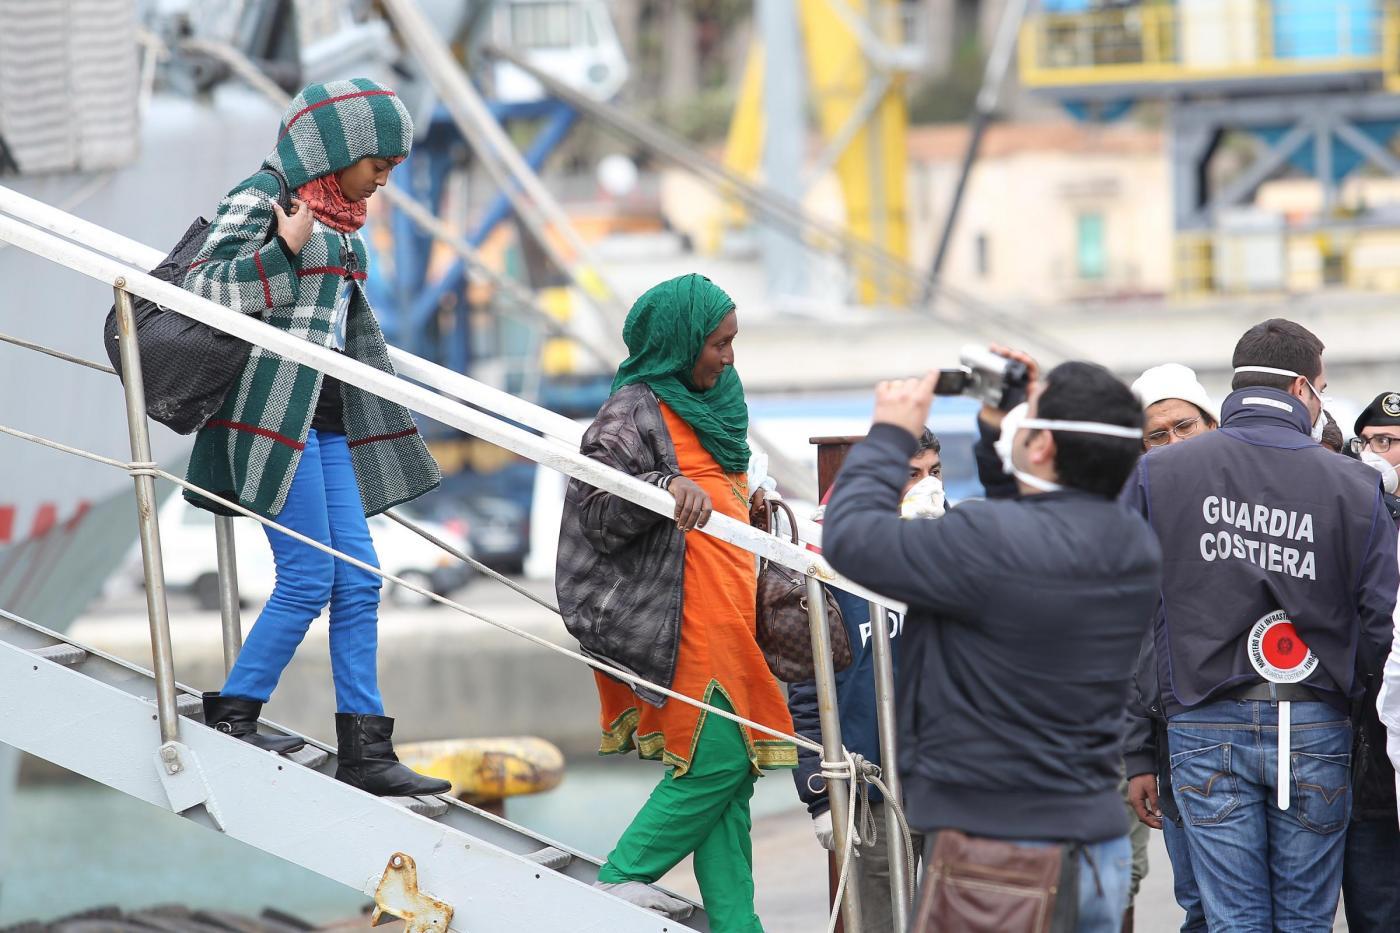 A Salerno sbarcano 545 migranti